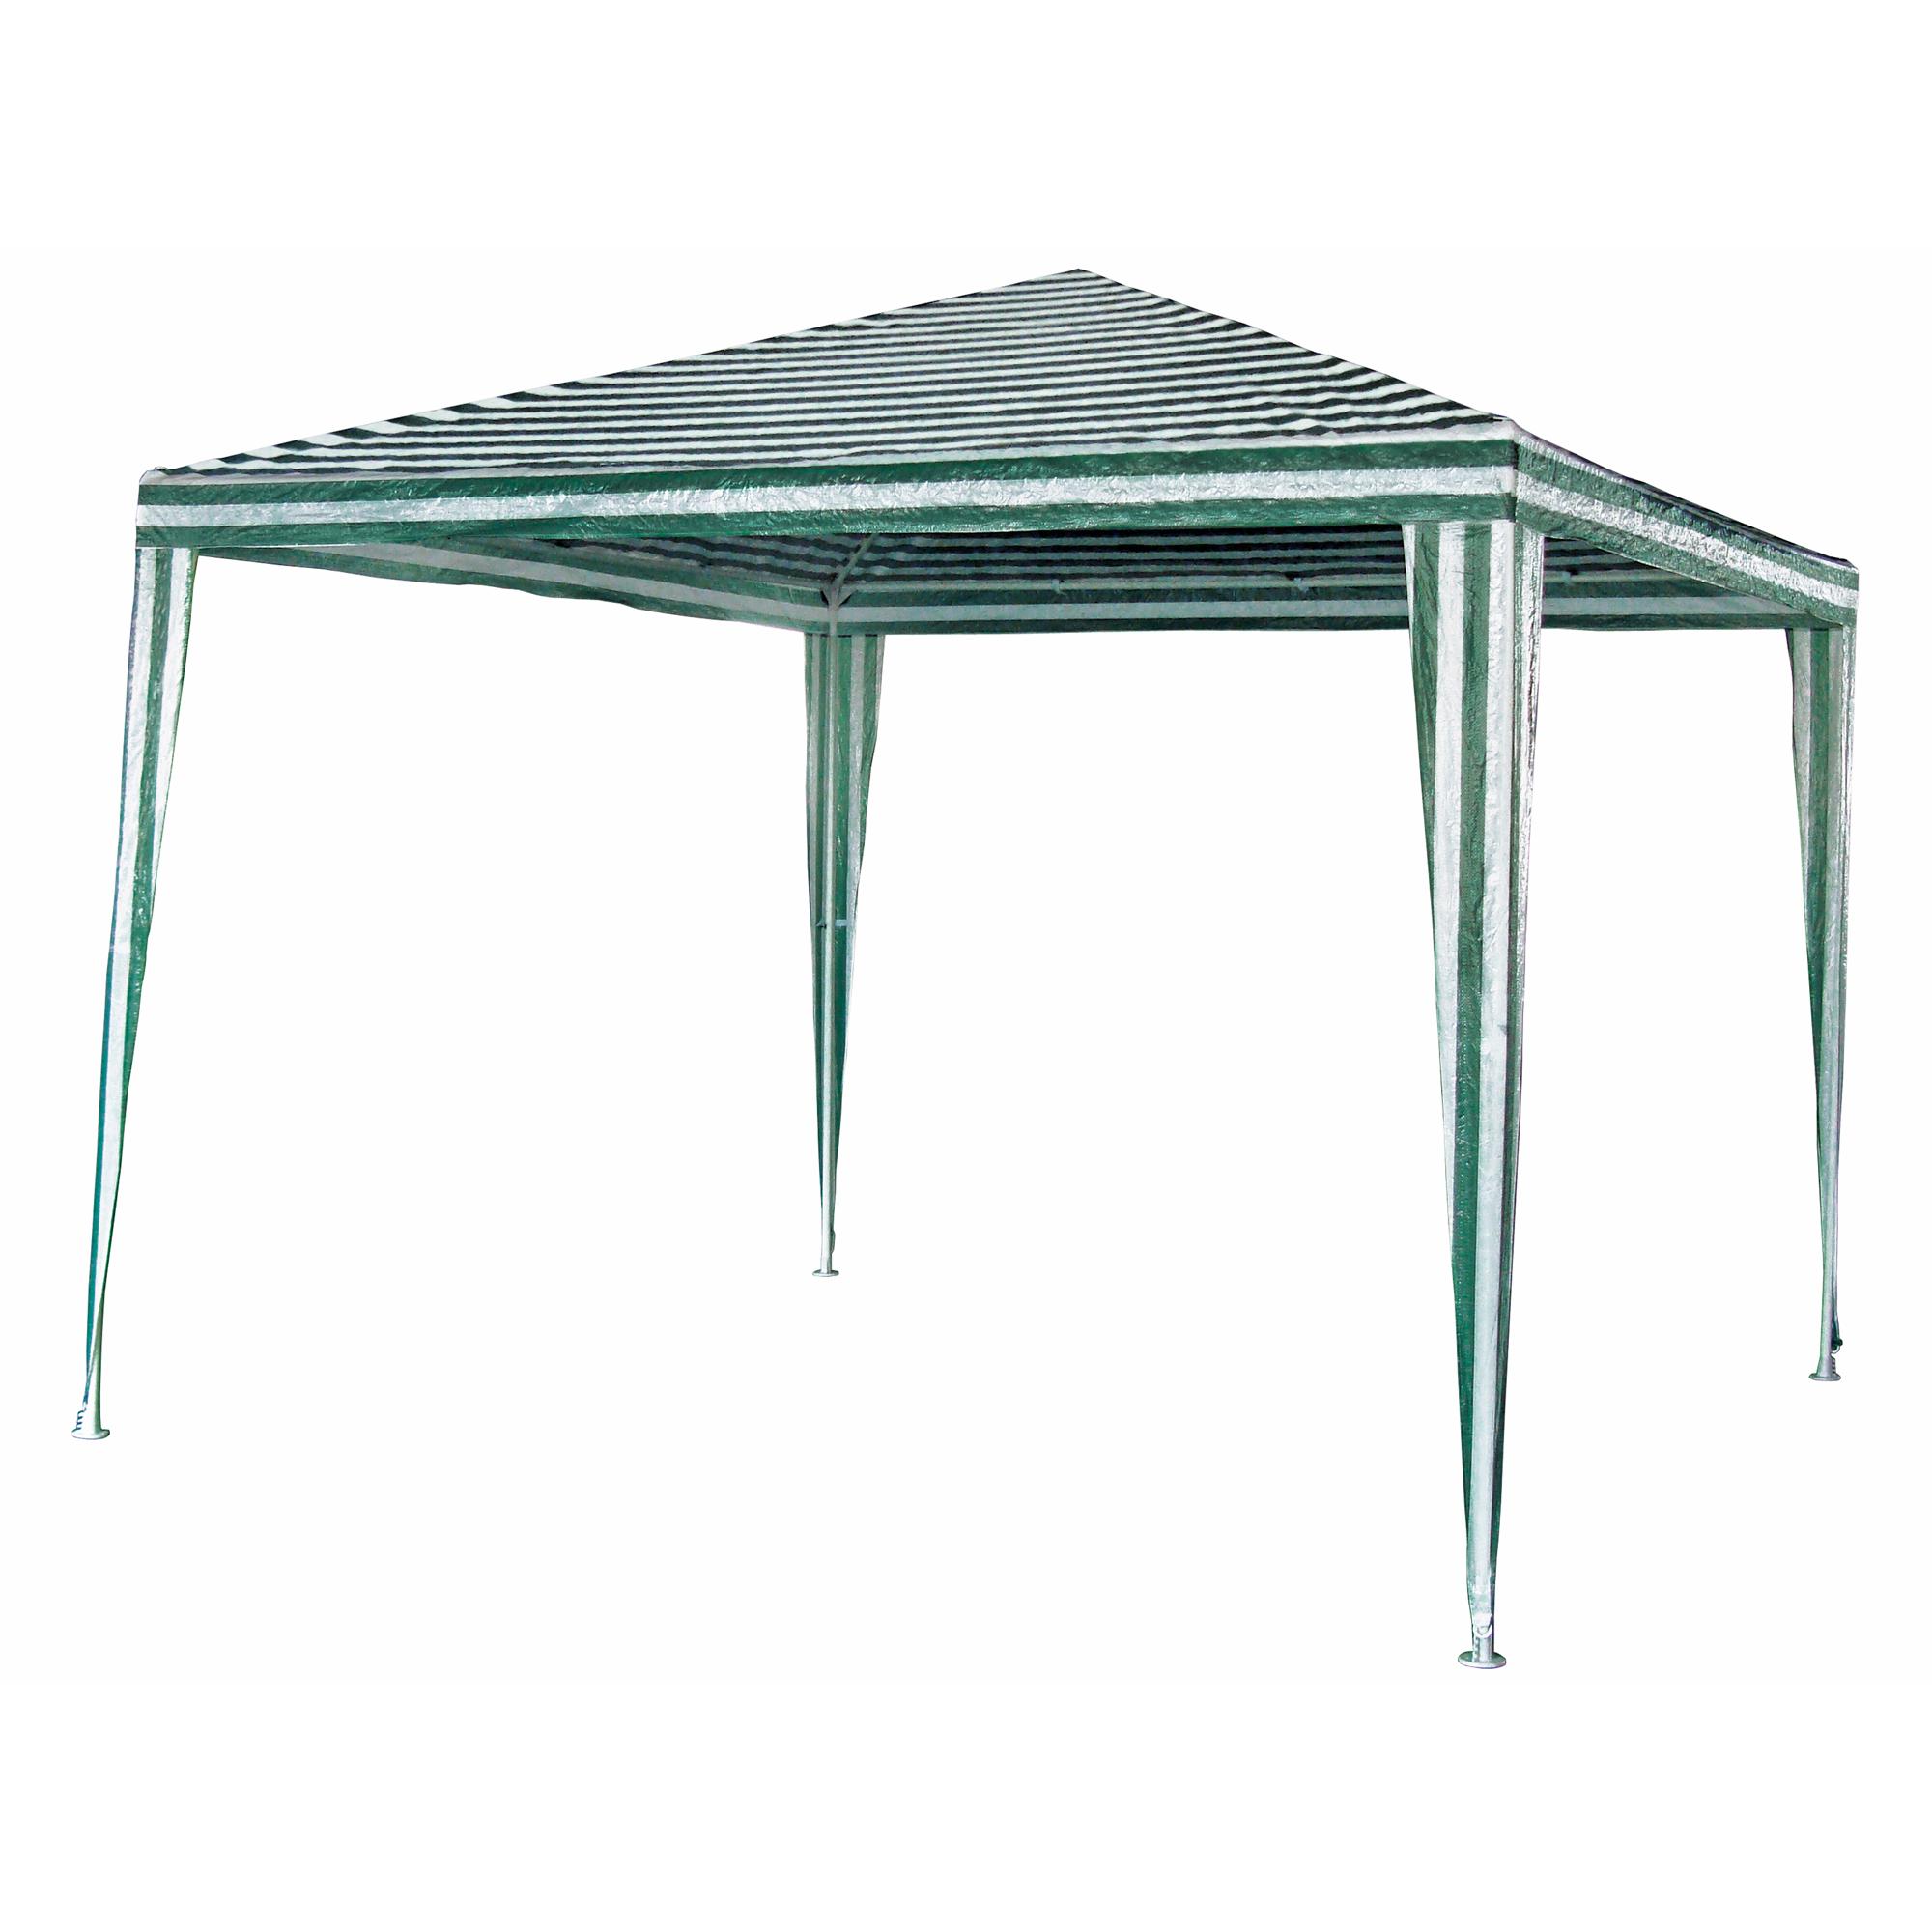 Berühmt Pavillon Polyethylen grün/weiß 3 x 3 m ǀ toom Baumarkt GG73